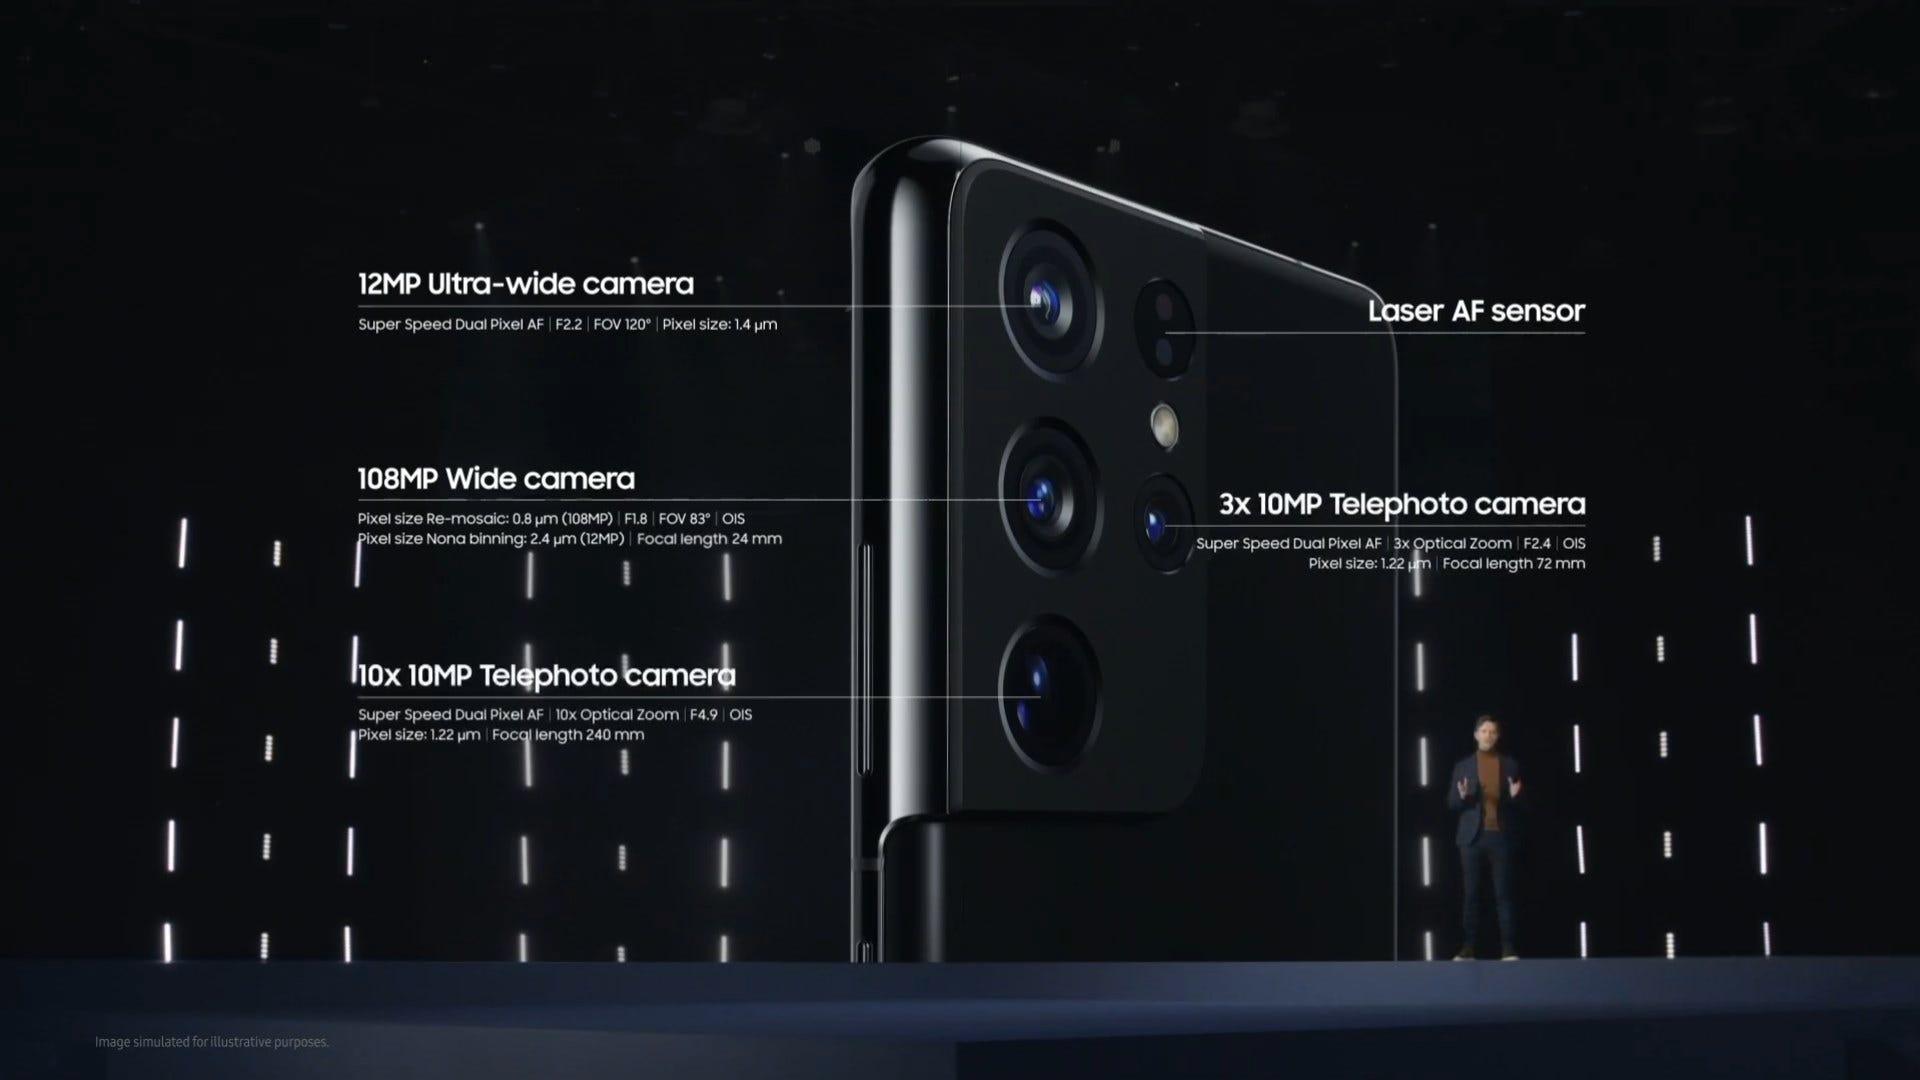 Galaxy S21 Ultra camera